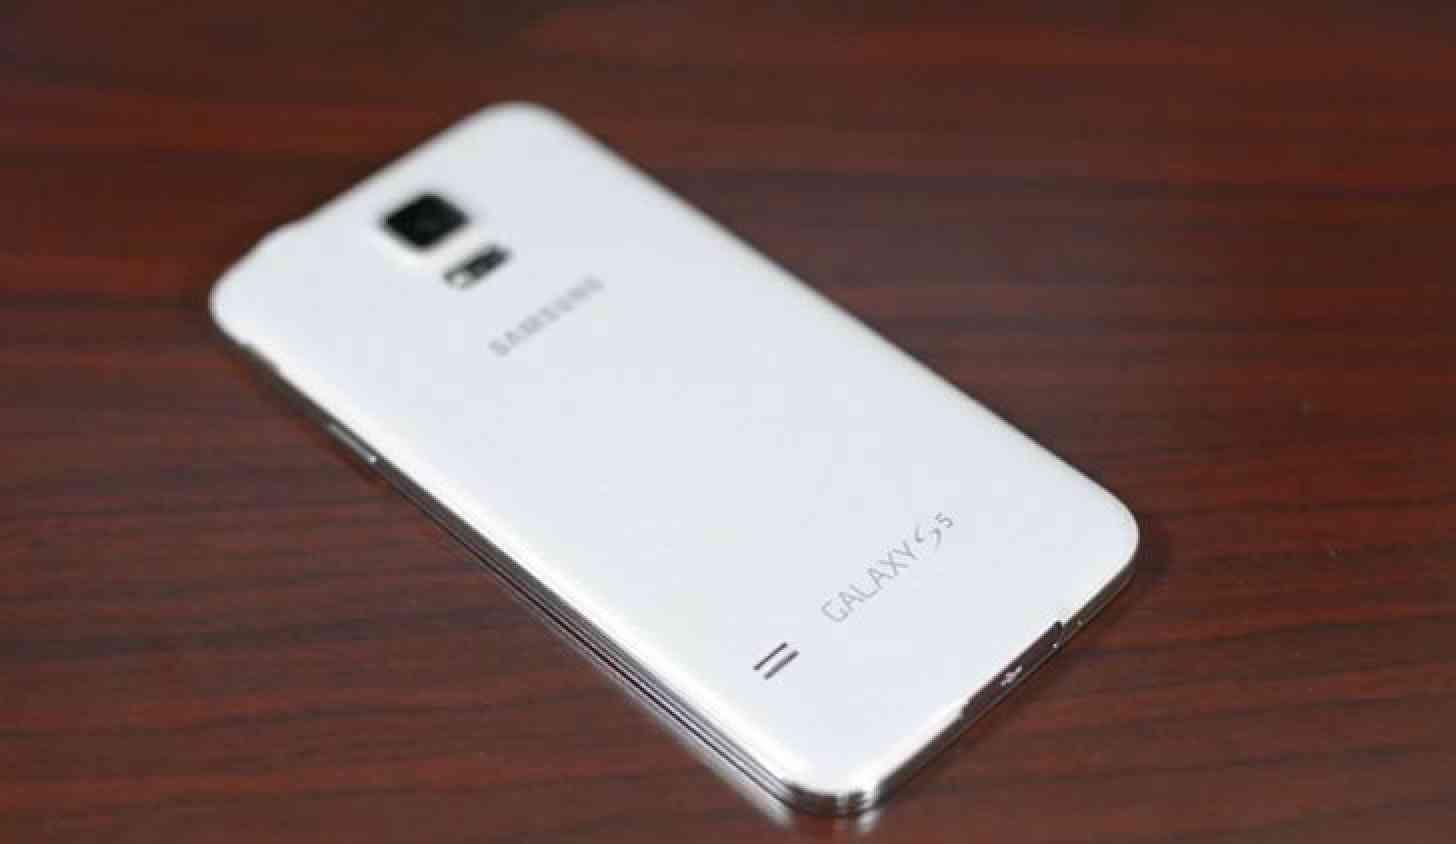 Samsung Galaxy S5 rear